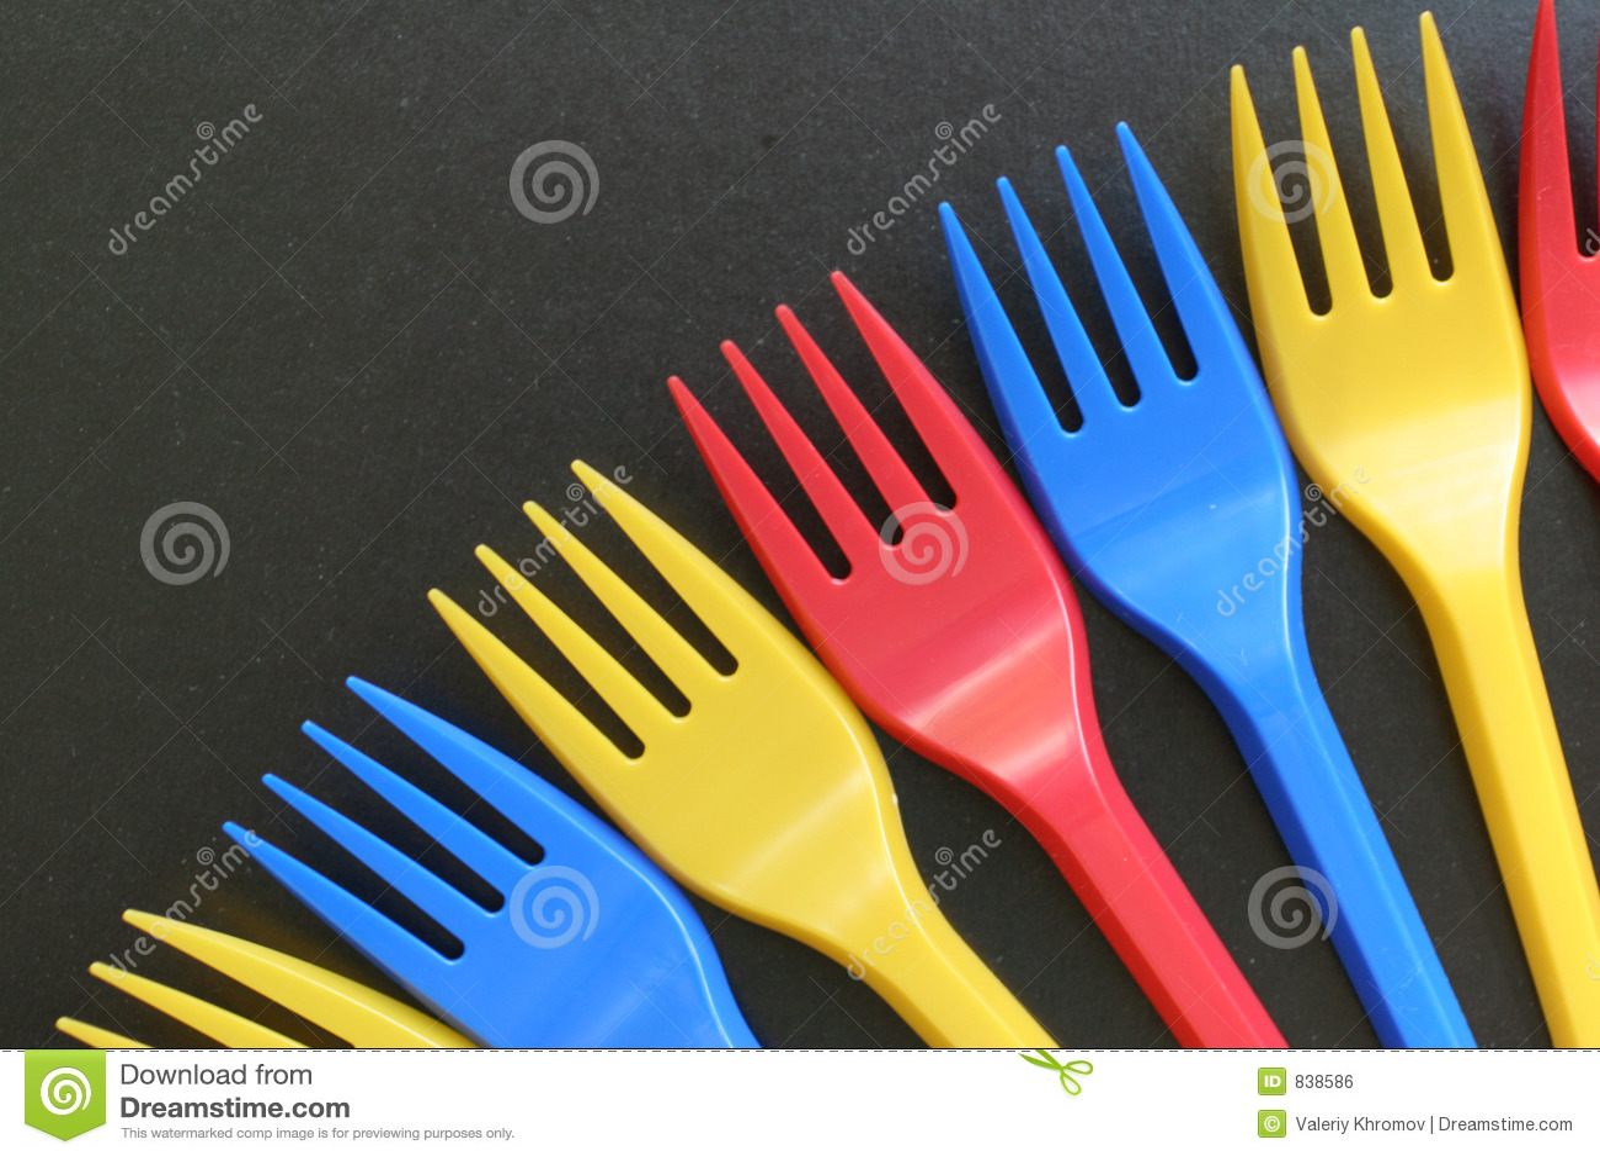 Multicolored forks